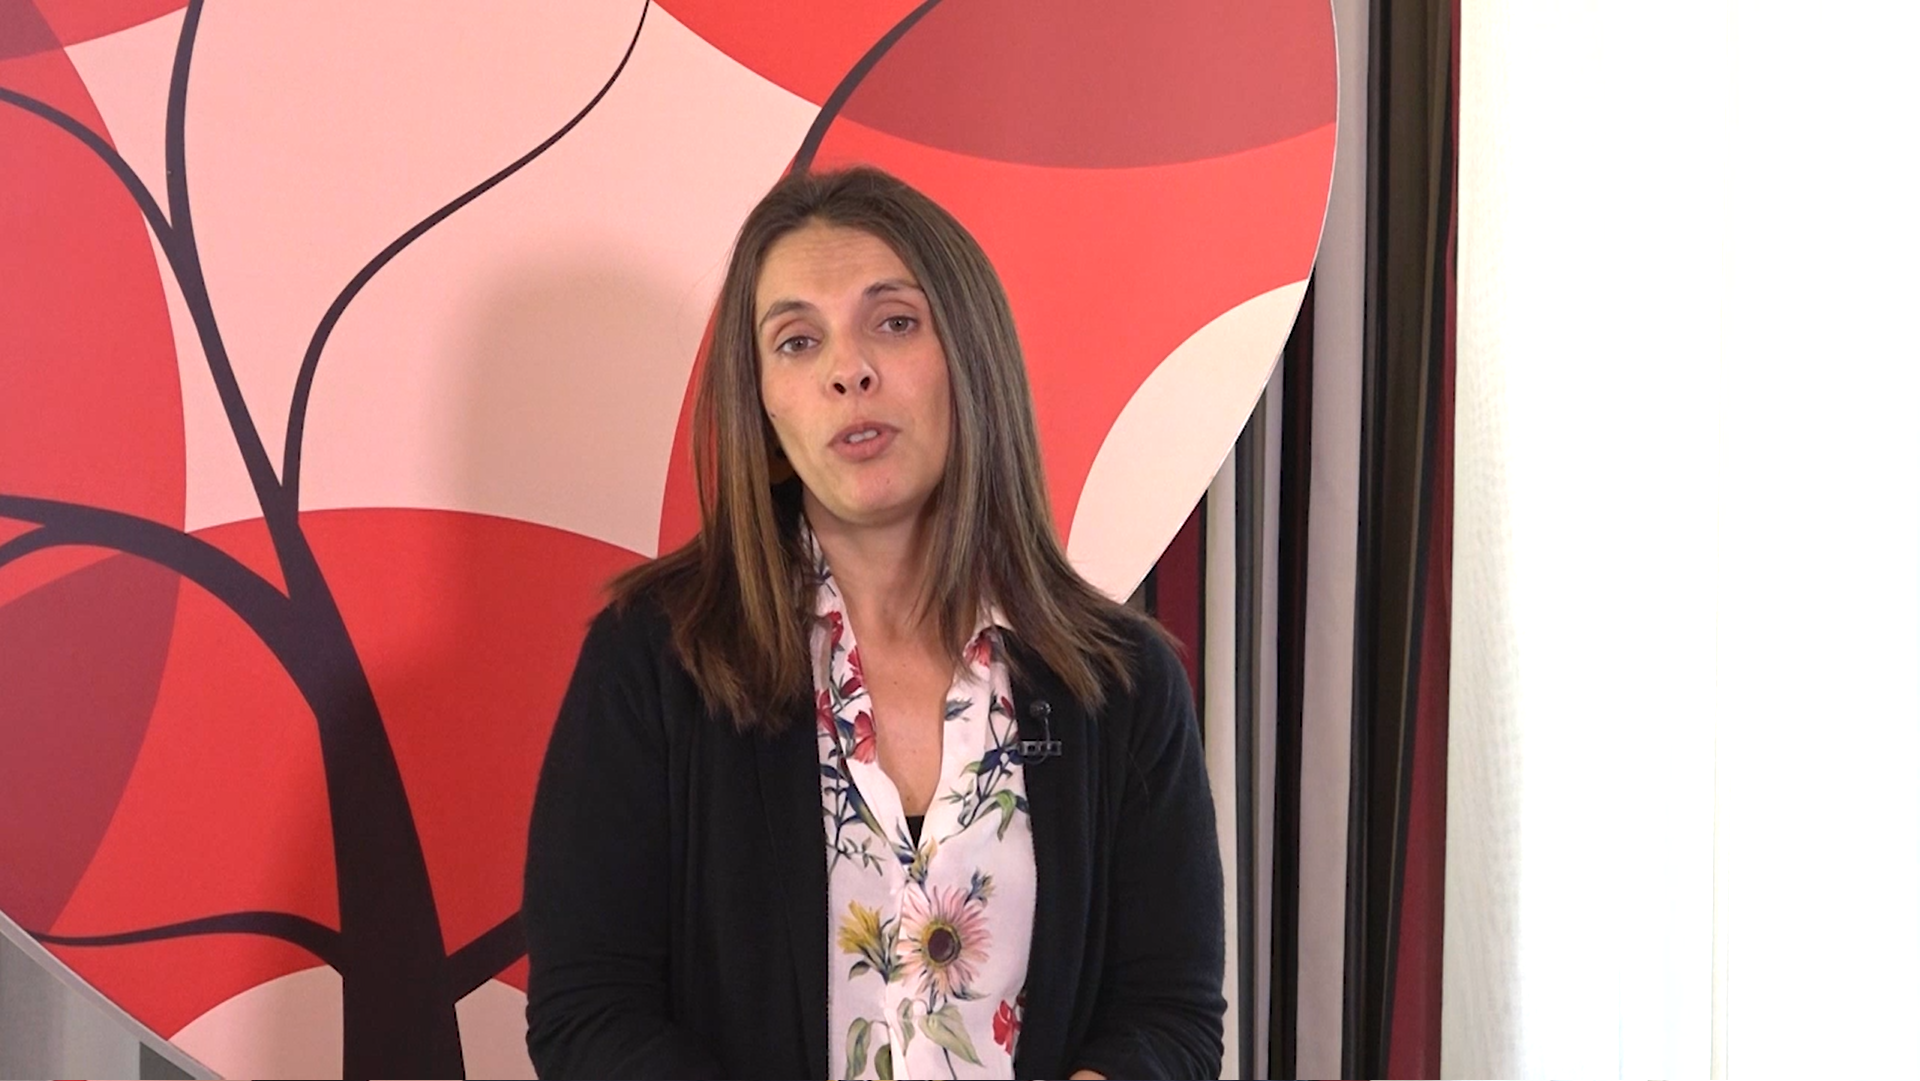 Bioelectronic Medicine. Challenging the future - Maria Guarino